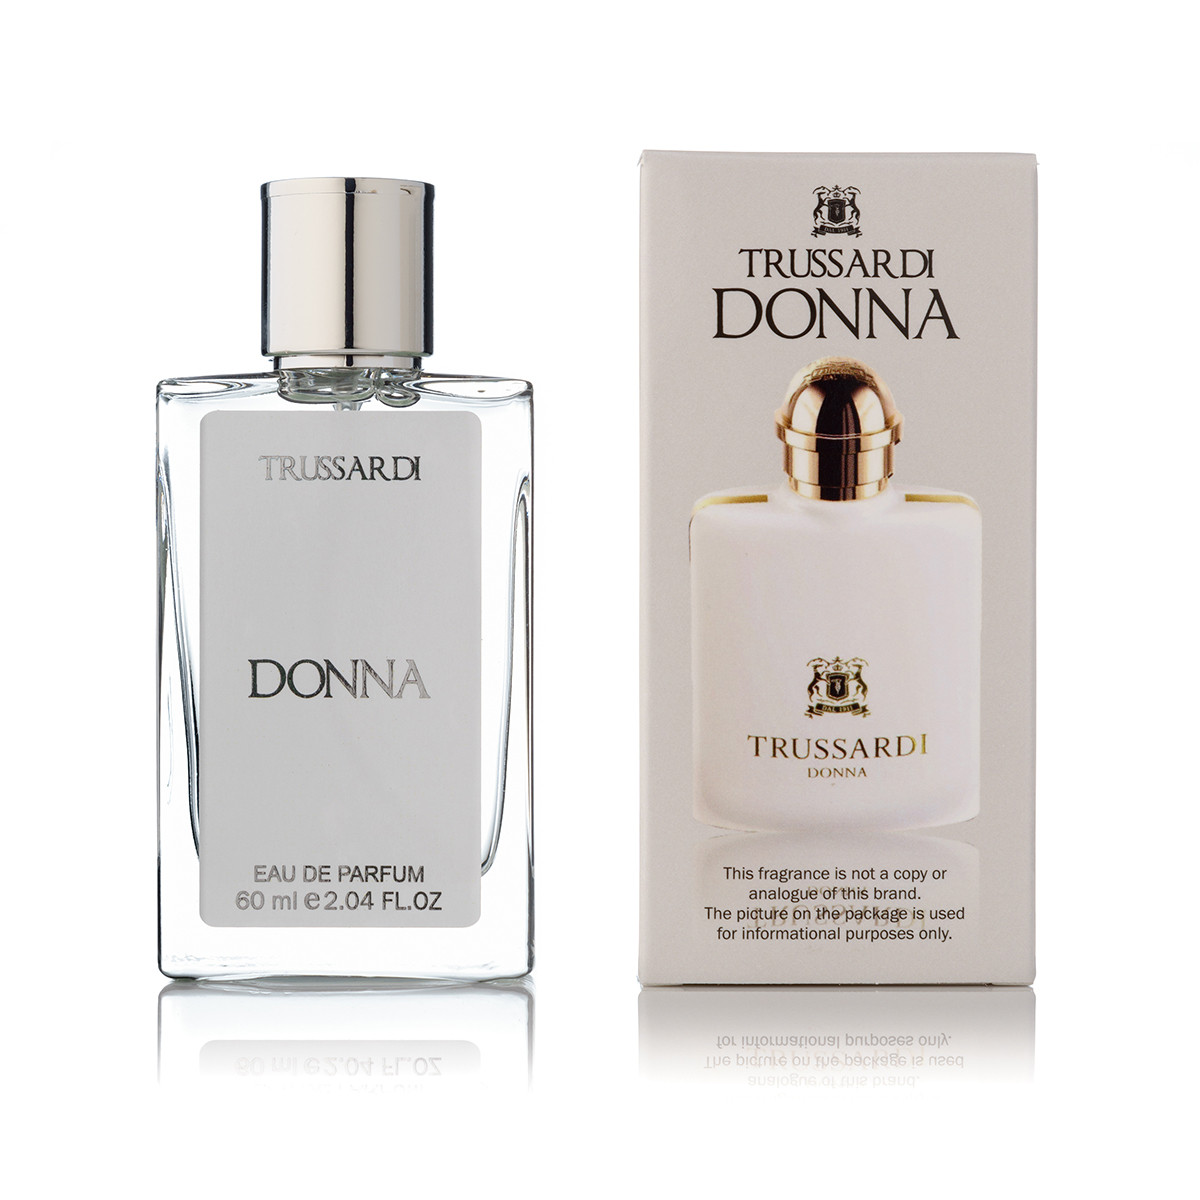 60 мл мини-парфюм Trussardi Donna Trussardi 2011  (Ж)